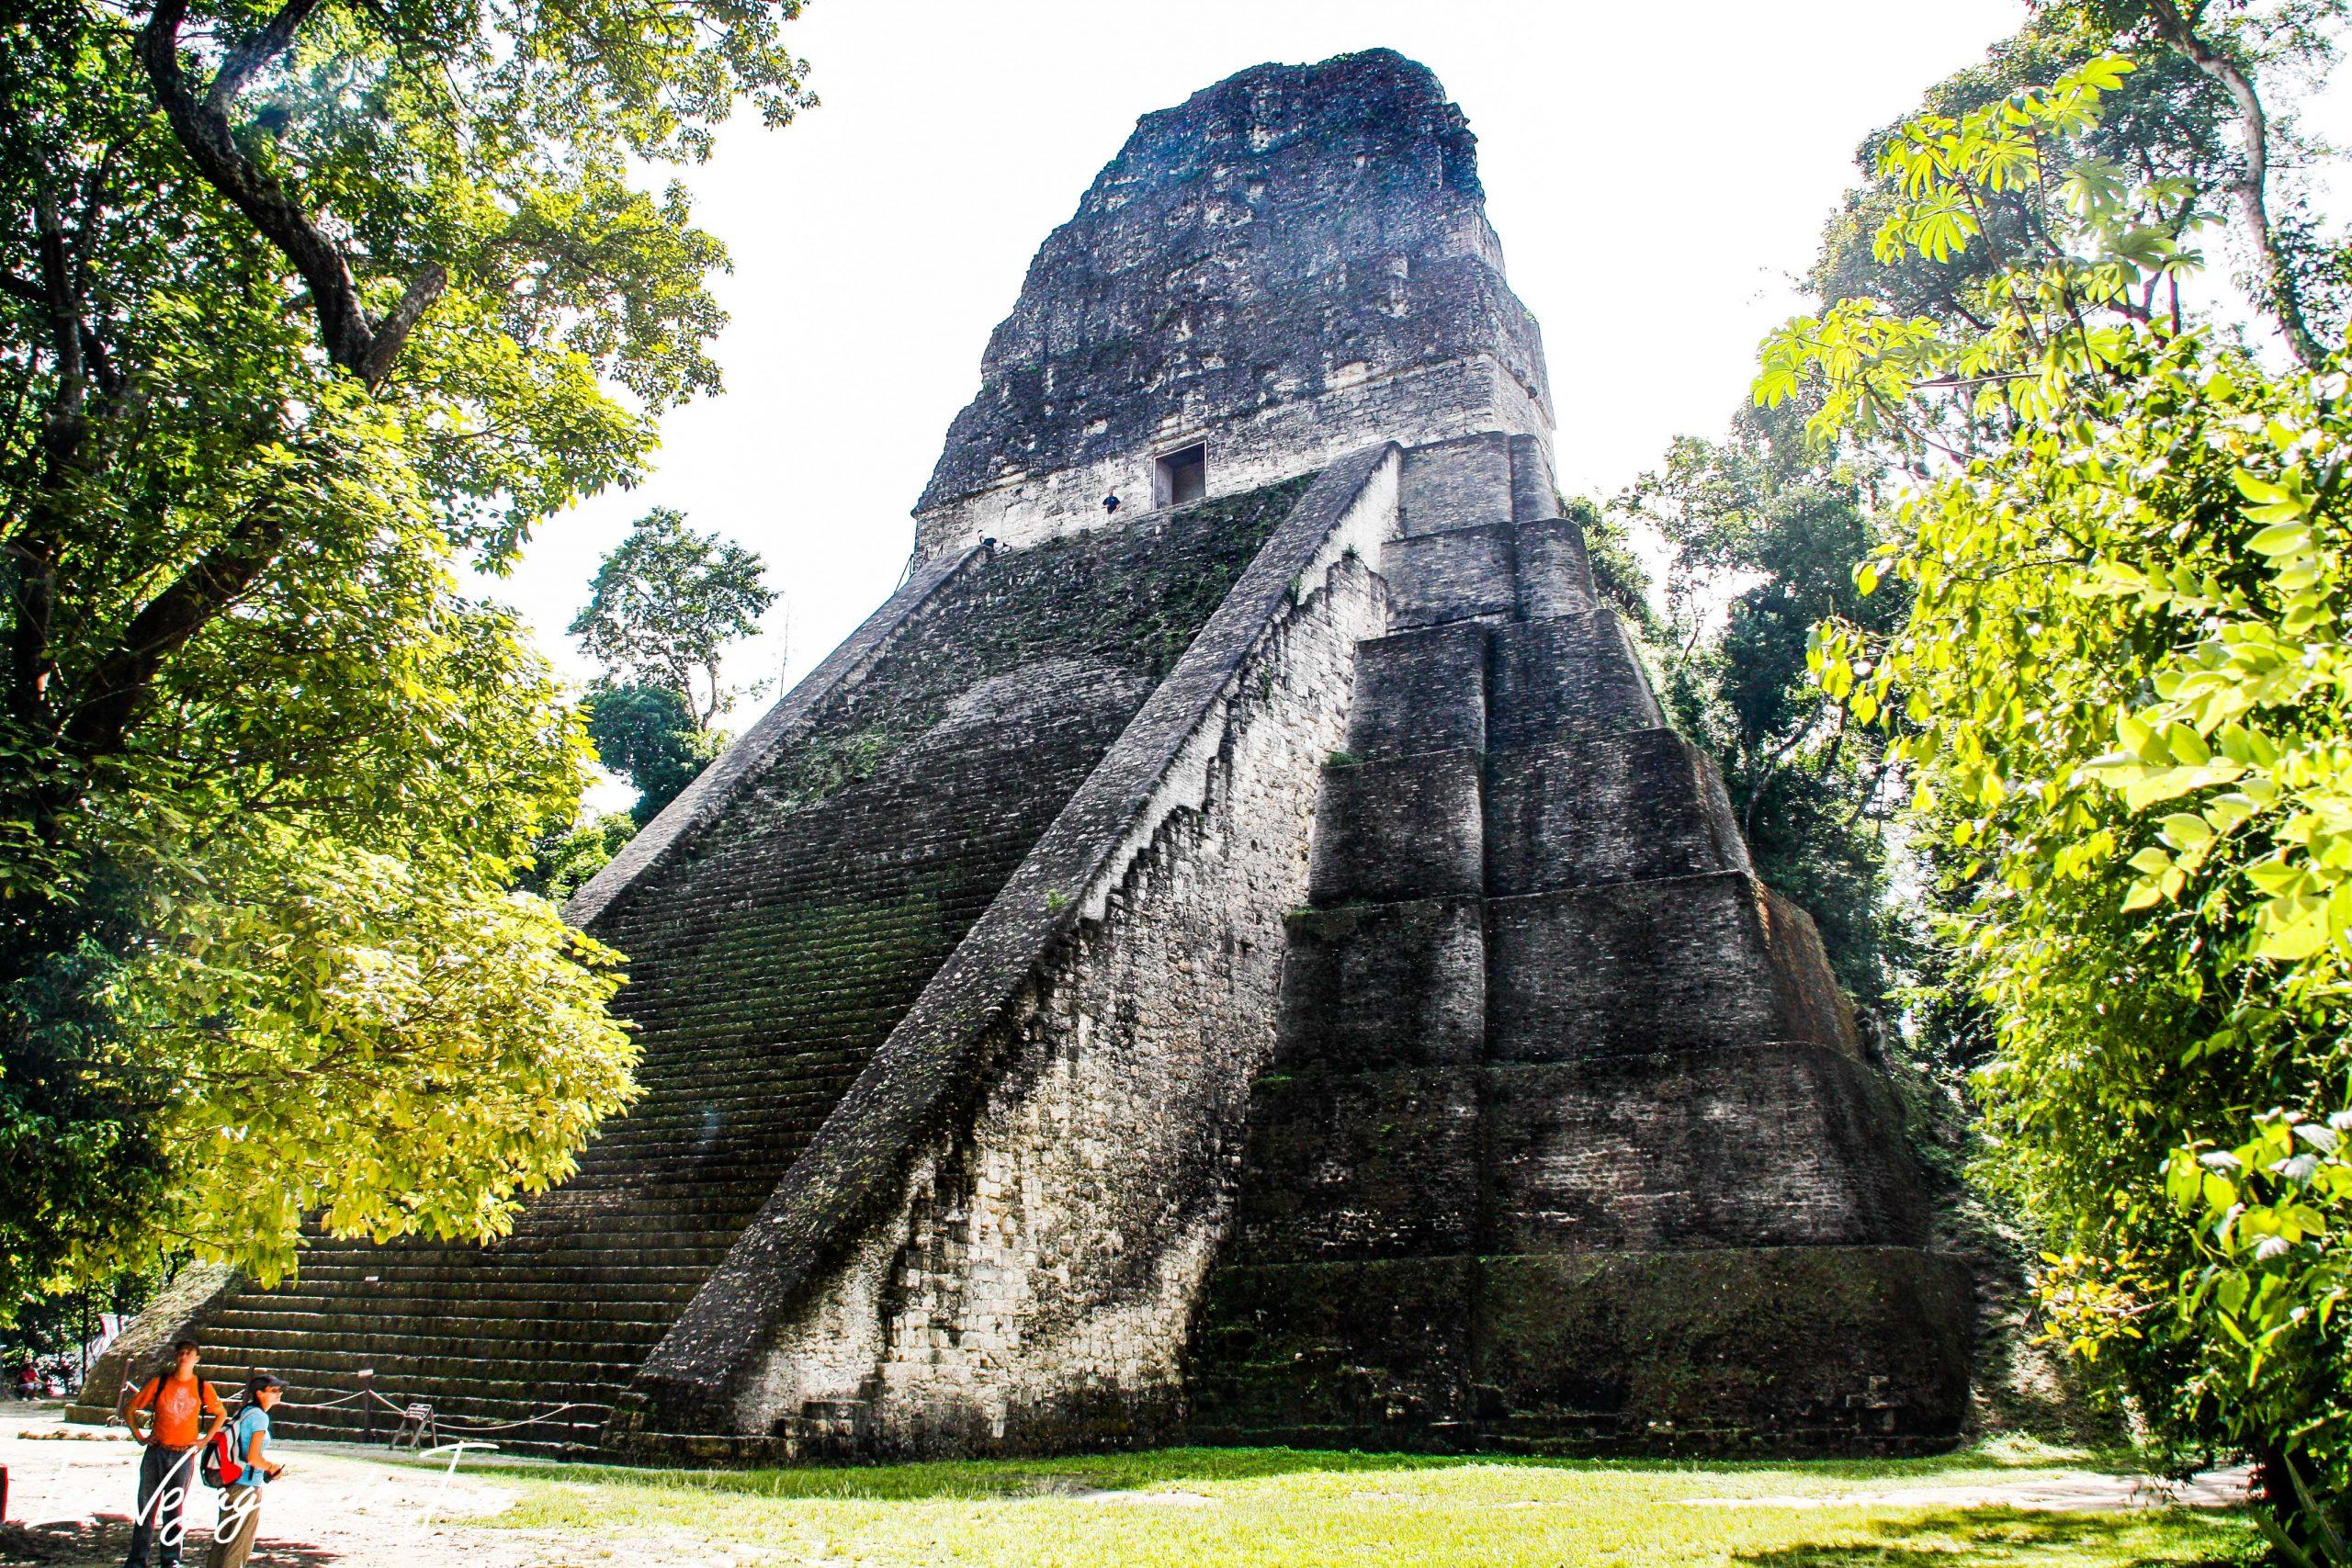 Tikal structure II